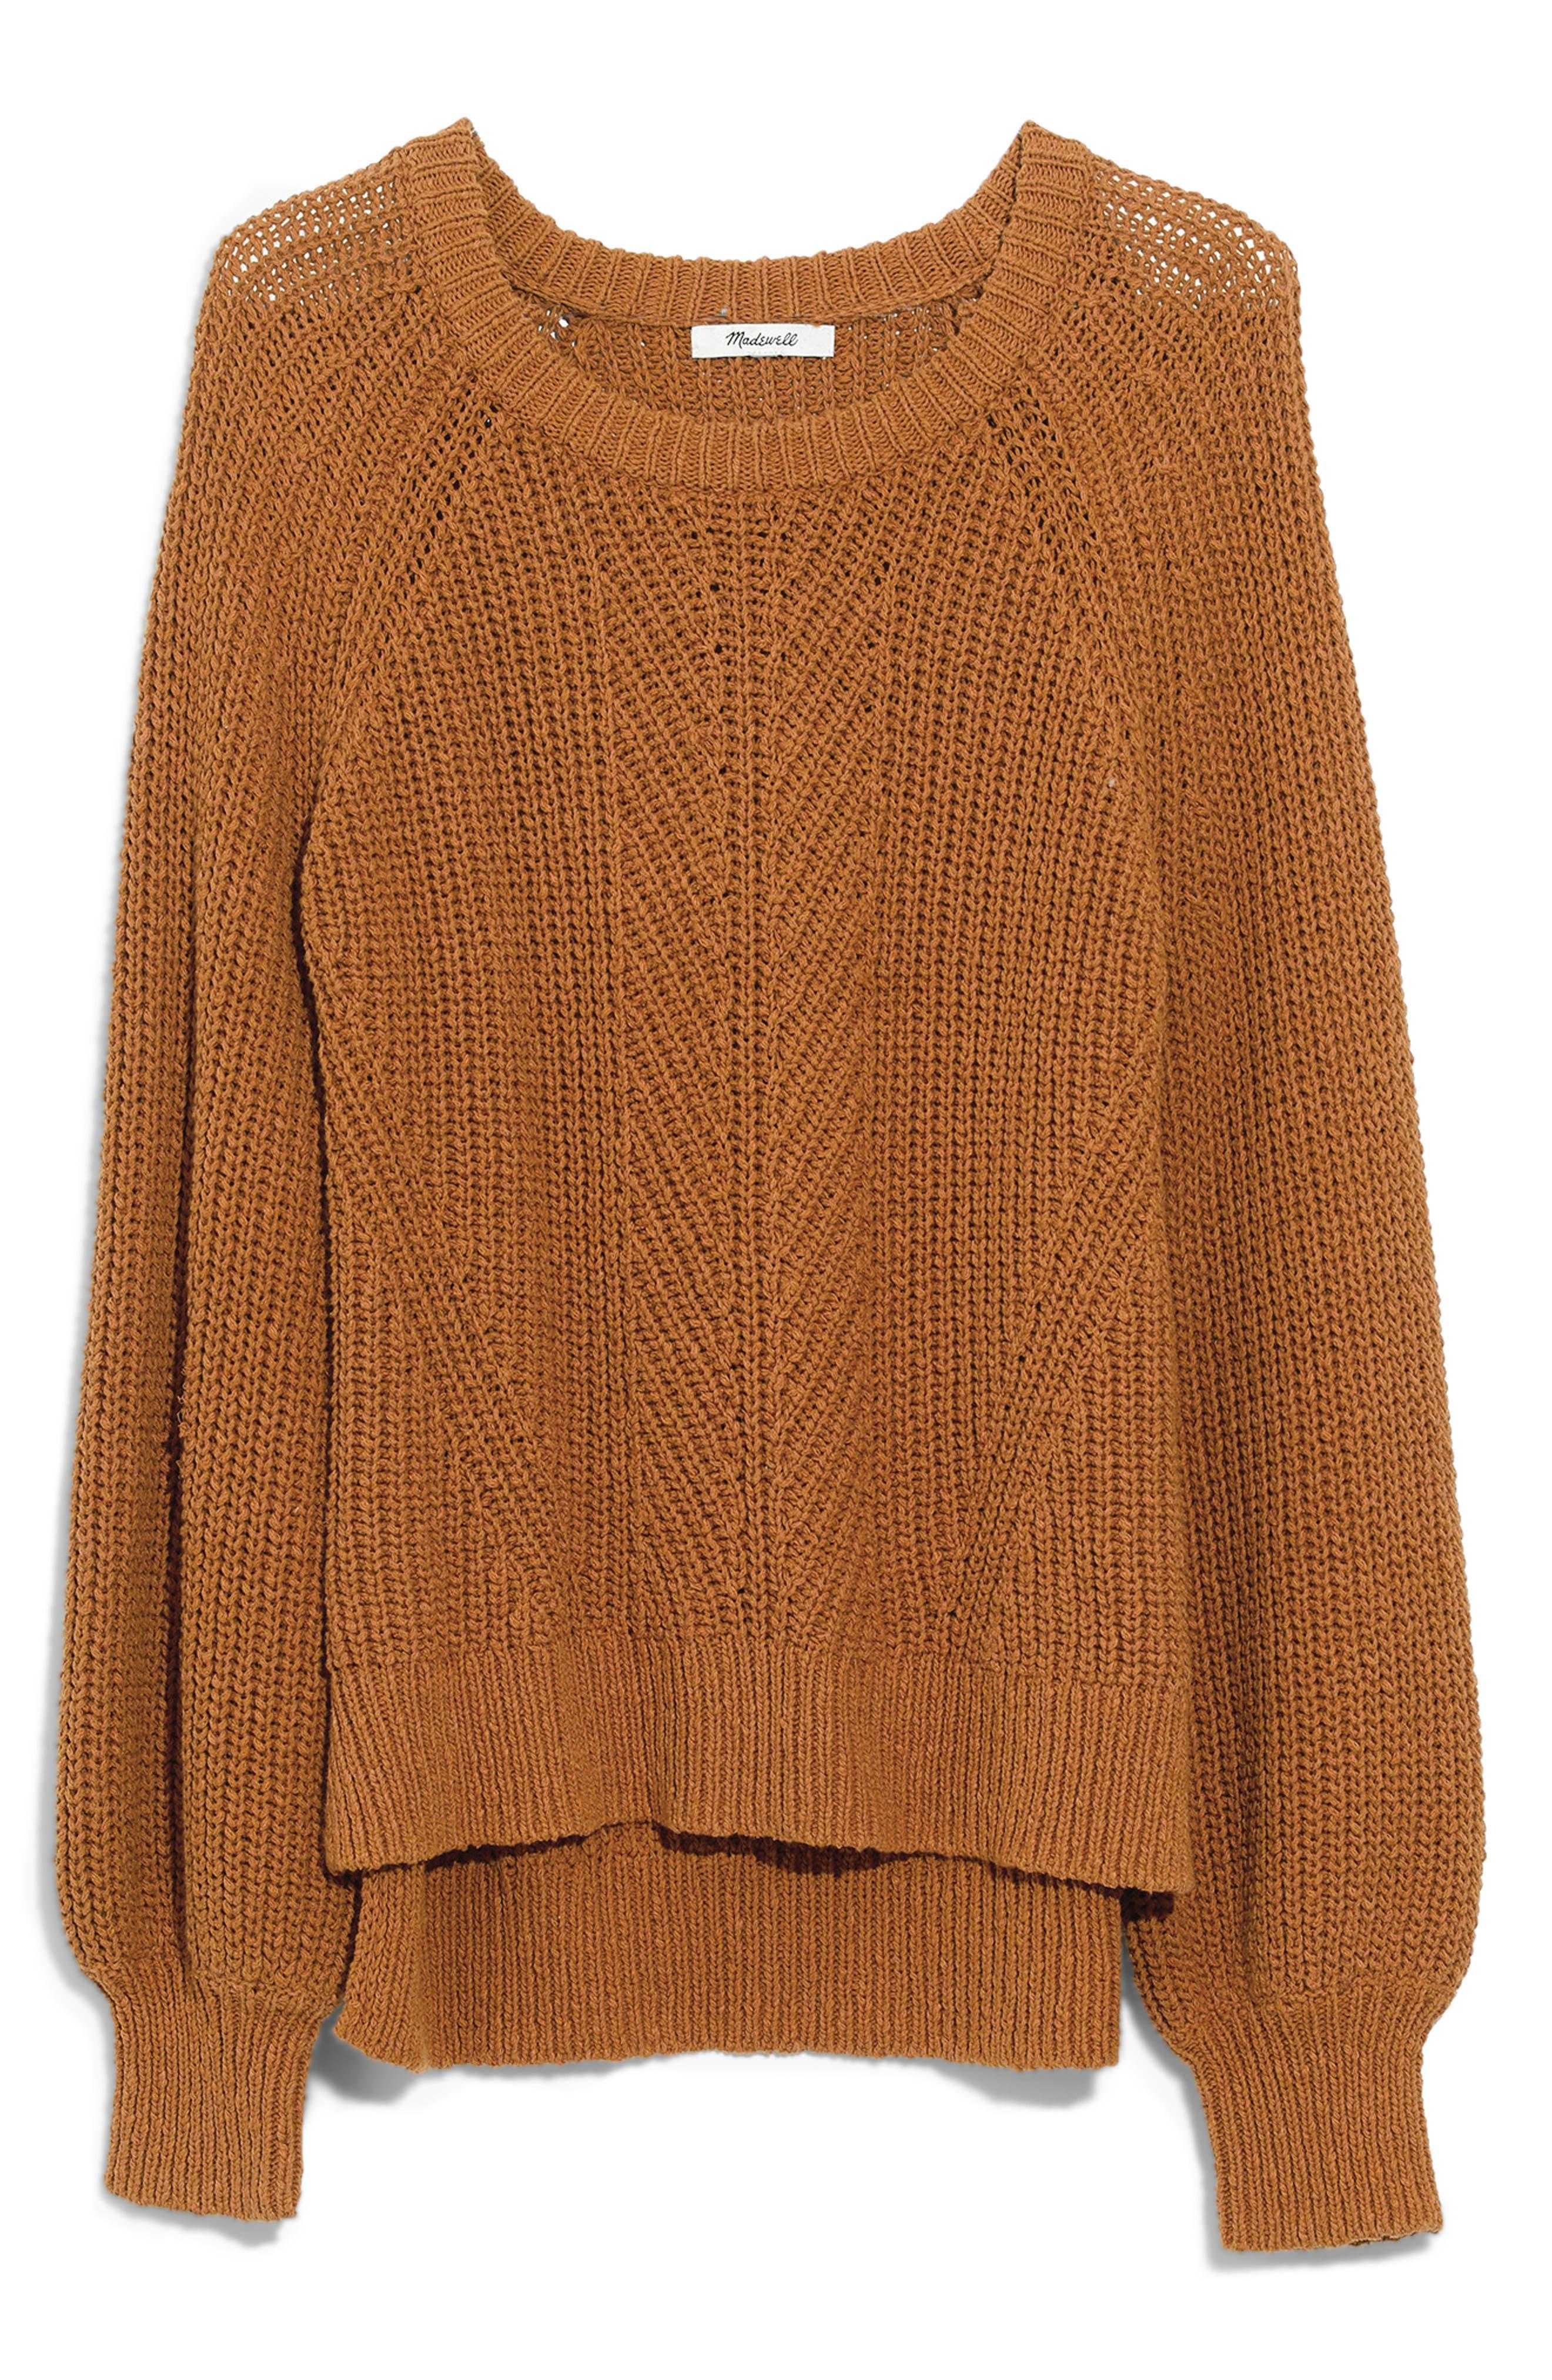 Balloon Sleeve Pullover Sweater,                             Main thumbnail 1, color,                             EGYPTIAN GOLD